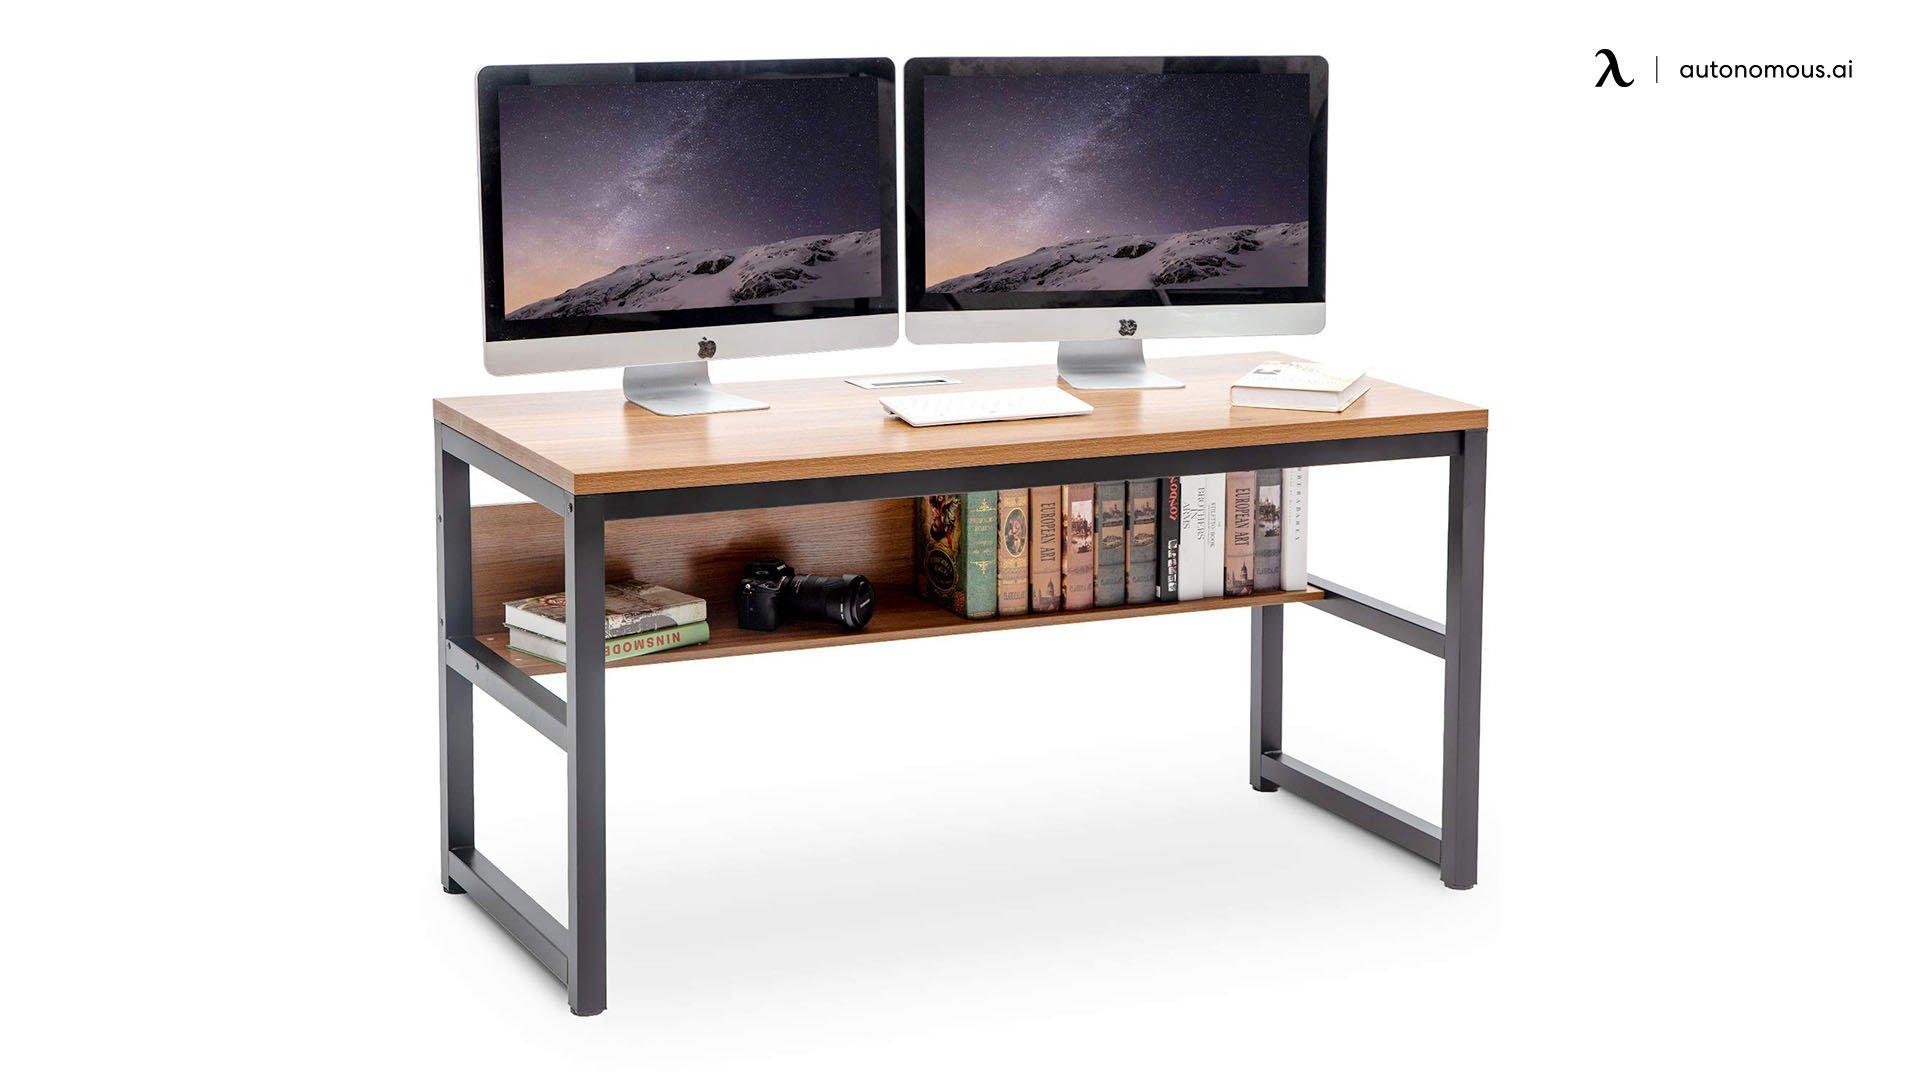 The Topsky Computer Desk